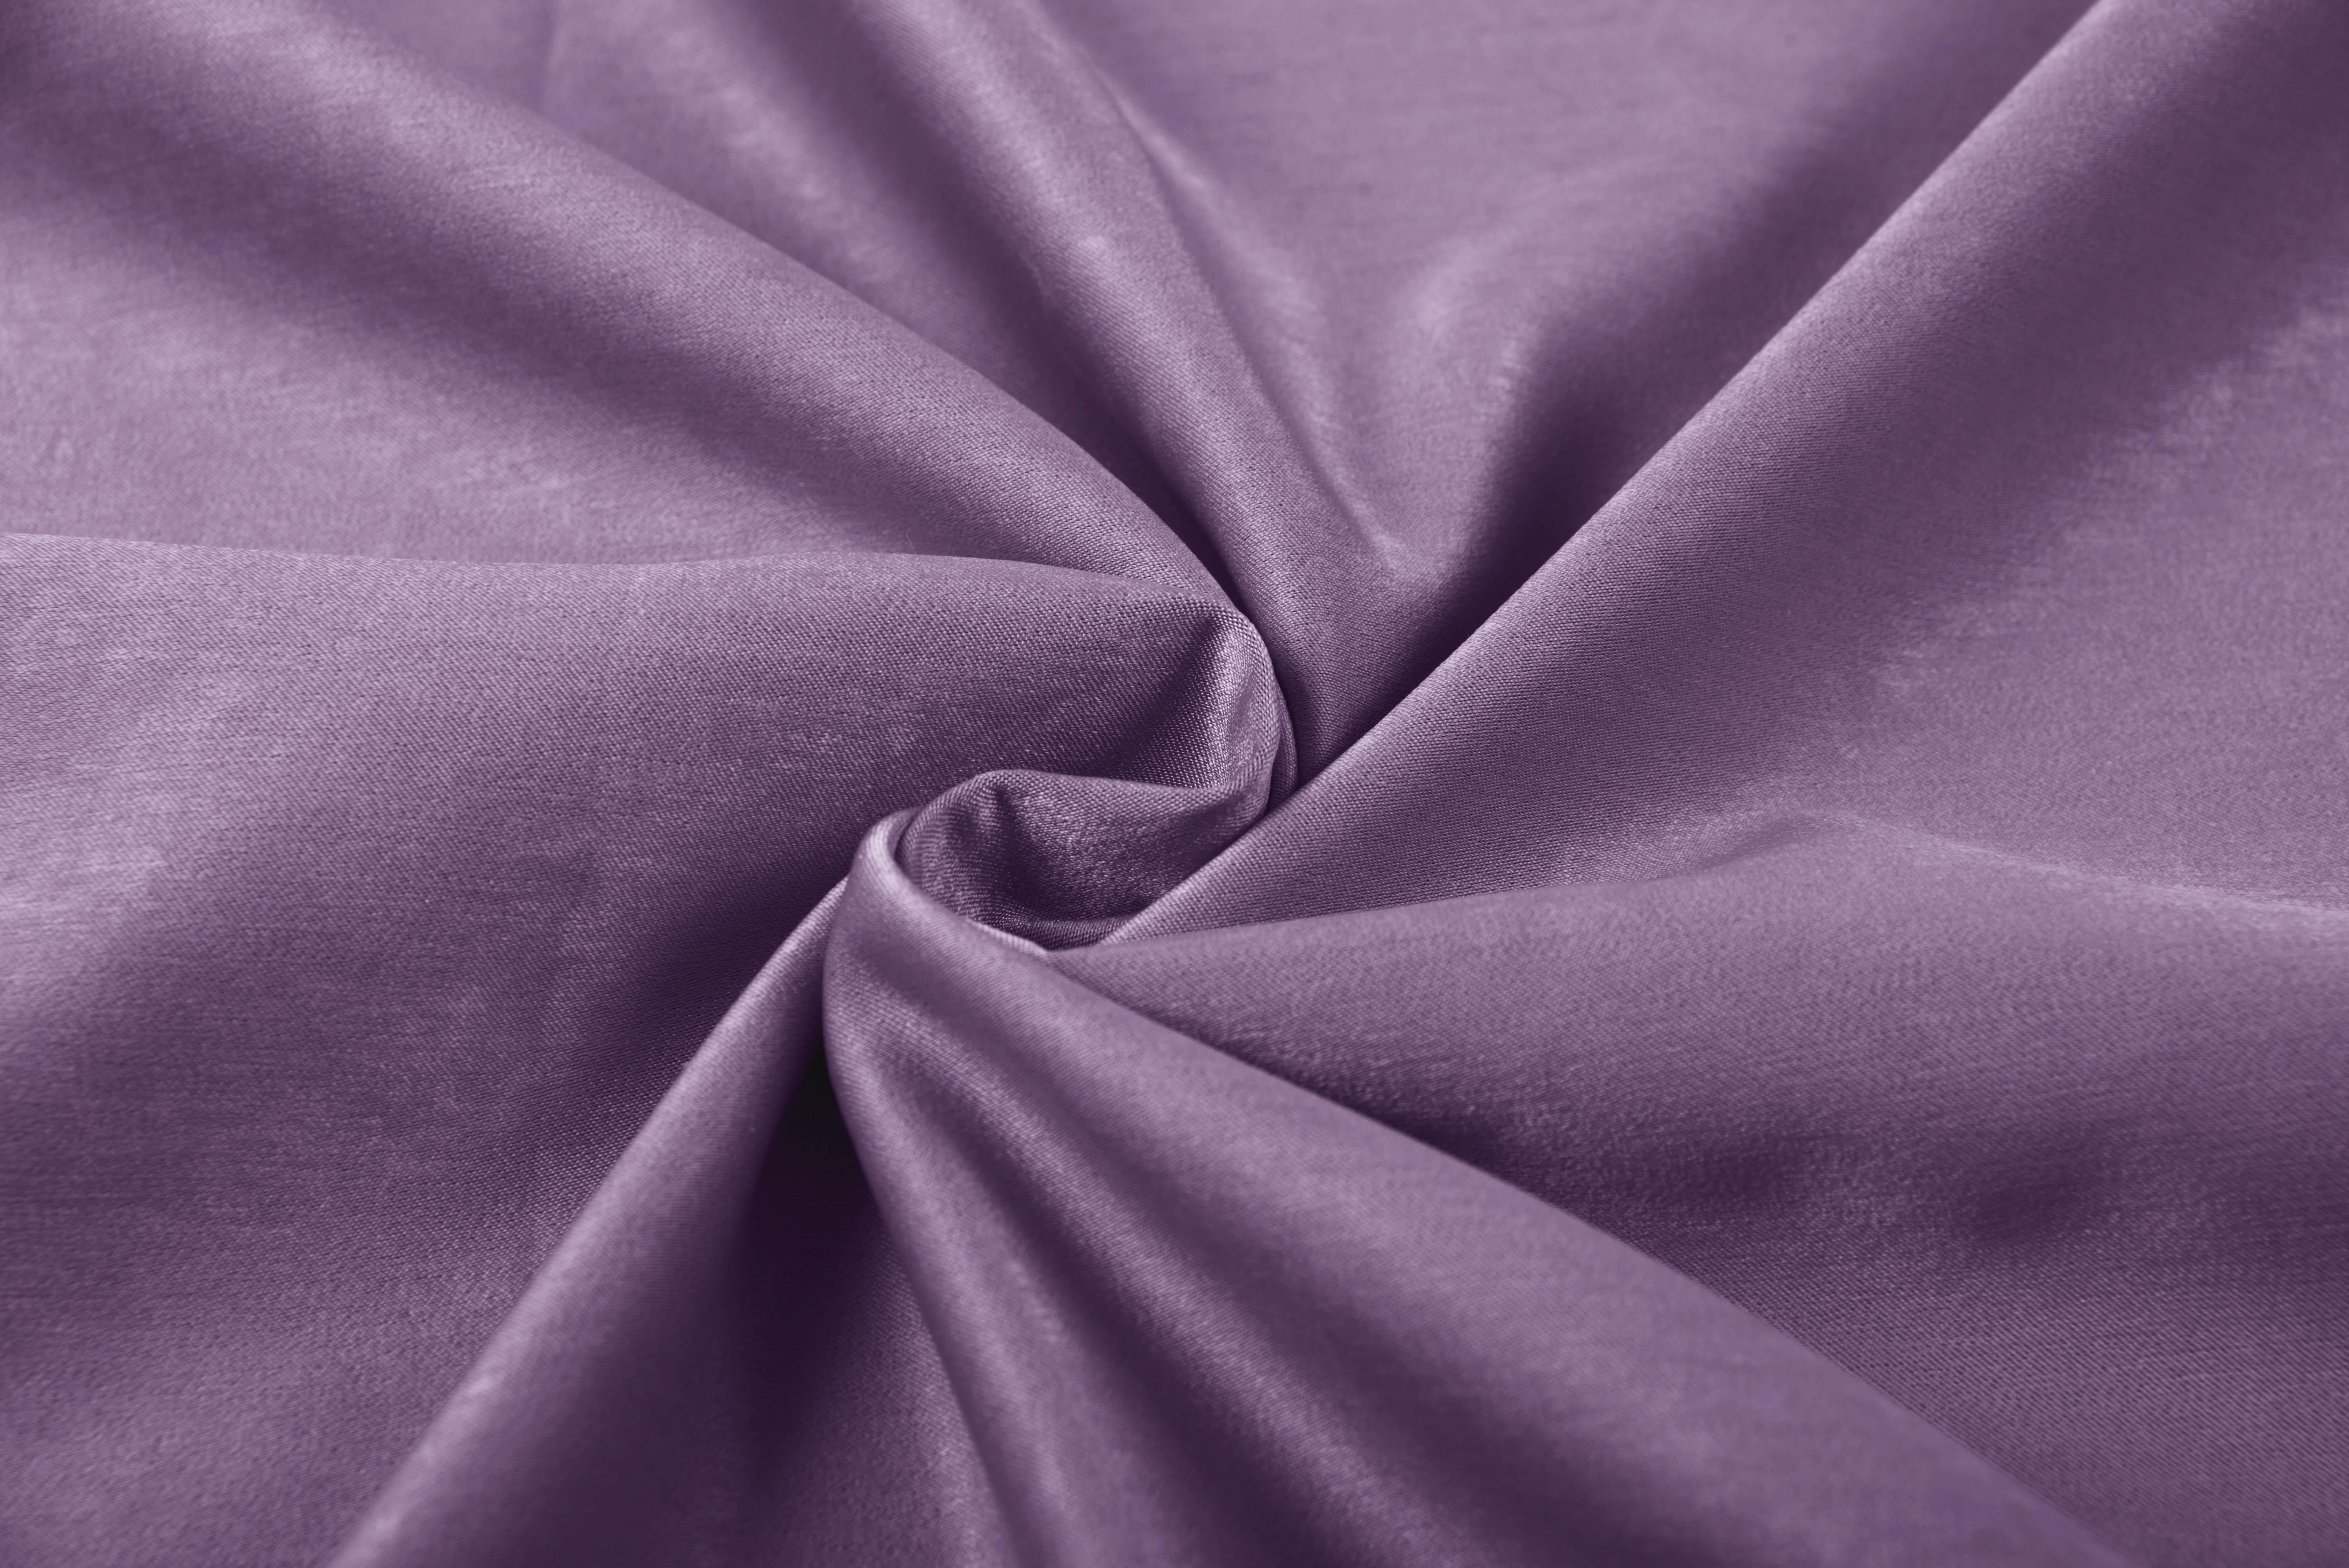 {} TexRepublic Материал Бархат Wet Silk Цвет: Сиреневый texrepublic материал бархат wet silk цвет брусника